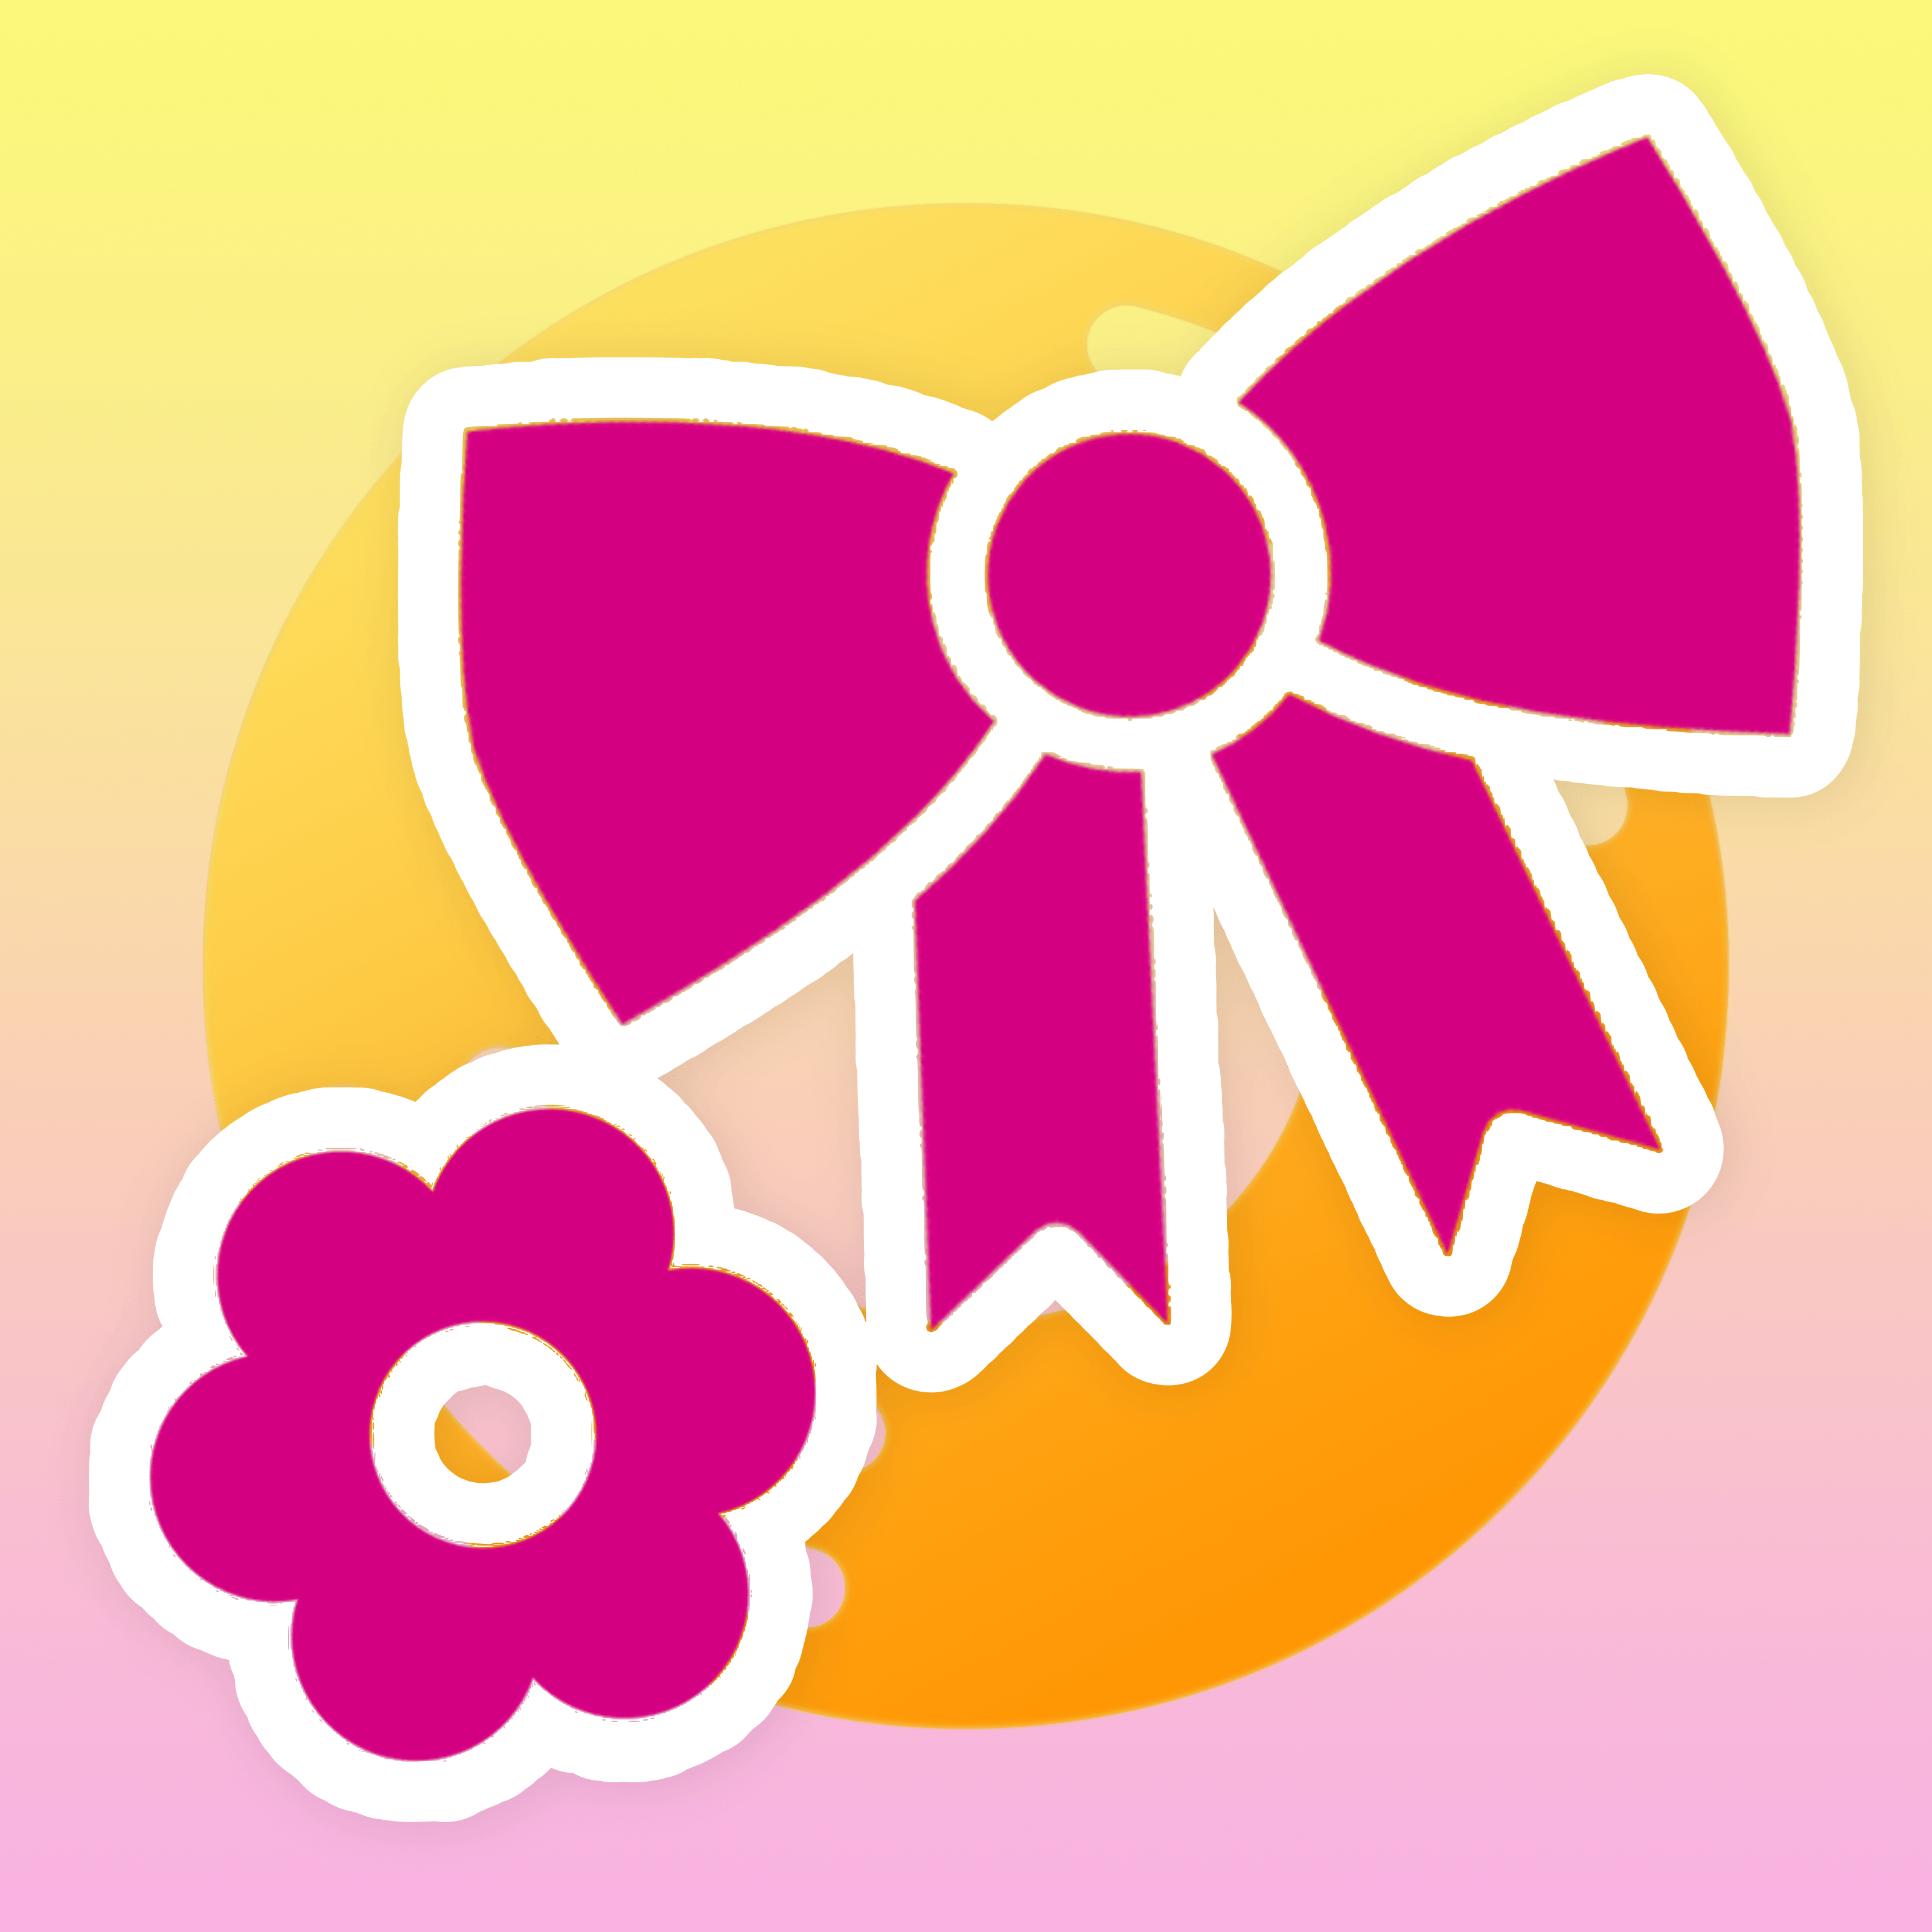 Ririsai avatar